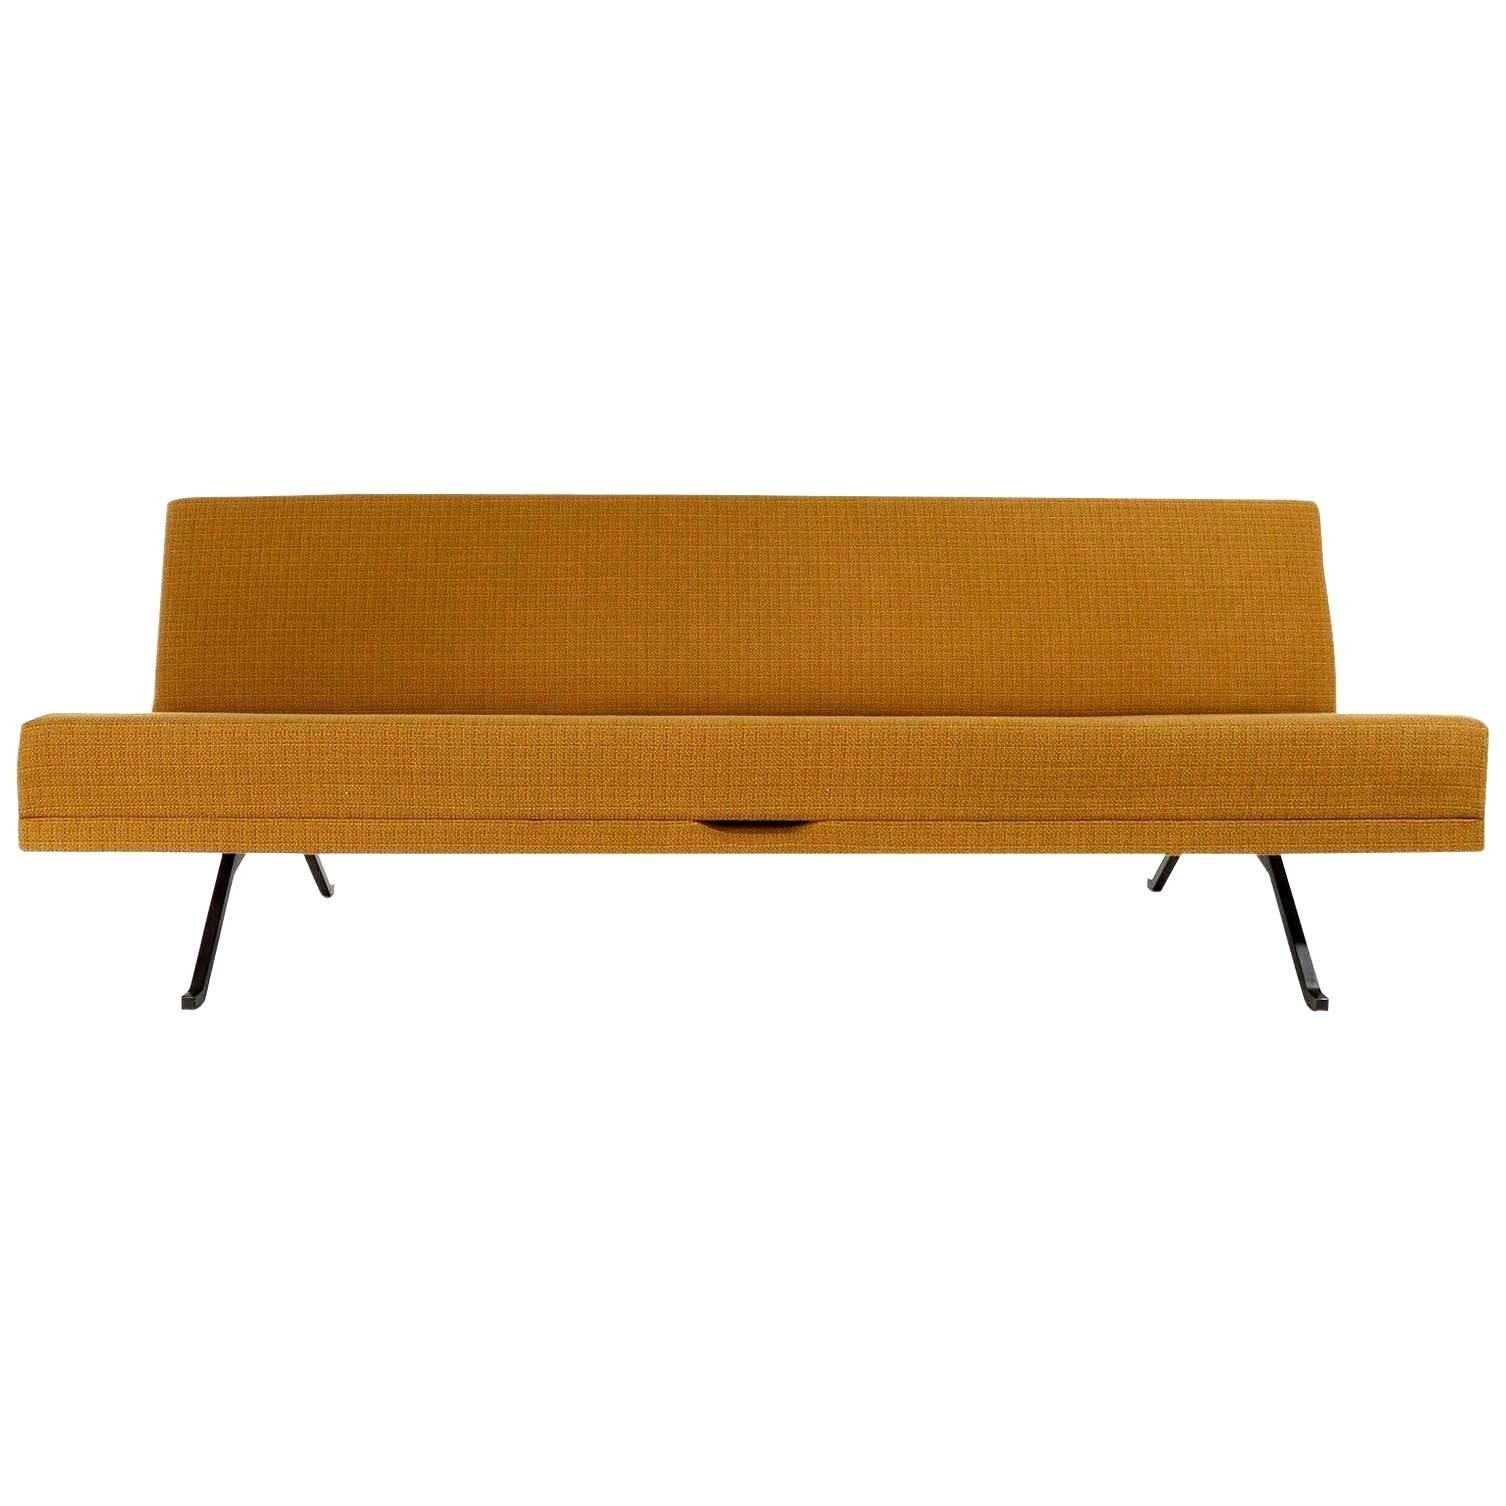 Johannes Spalt 'Constanze' Convertible Daybed Sofa by Wittmann, Austria, 1970s